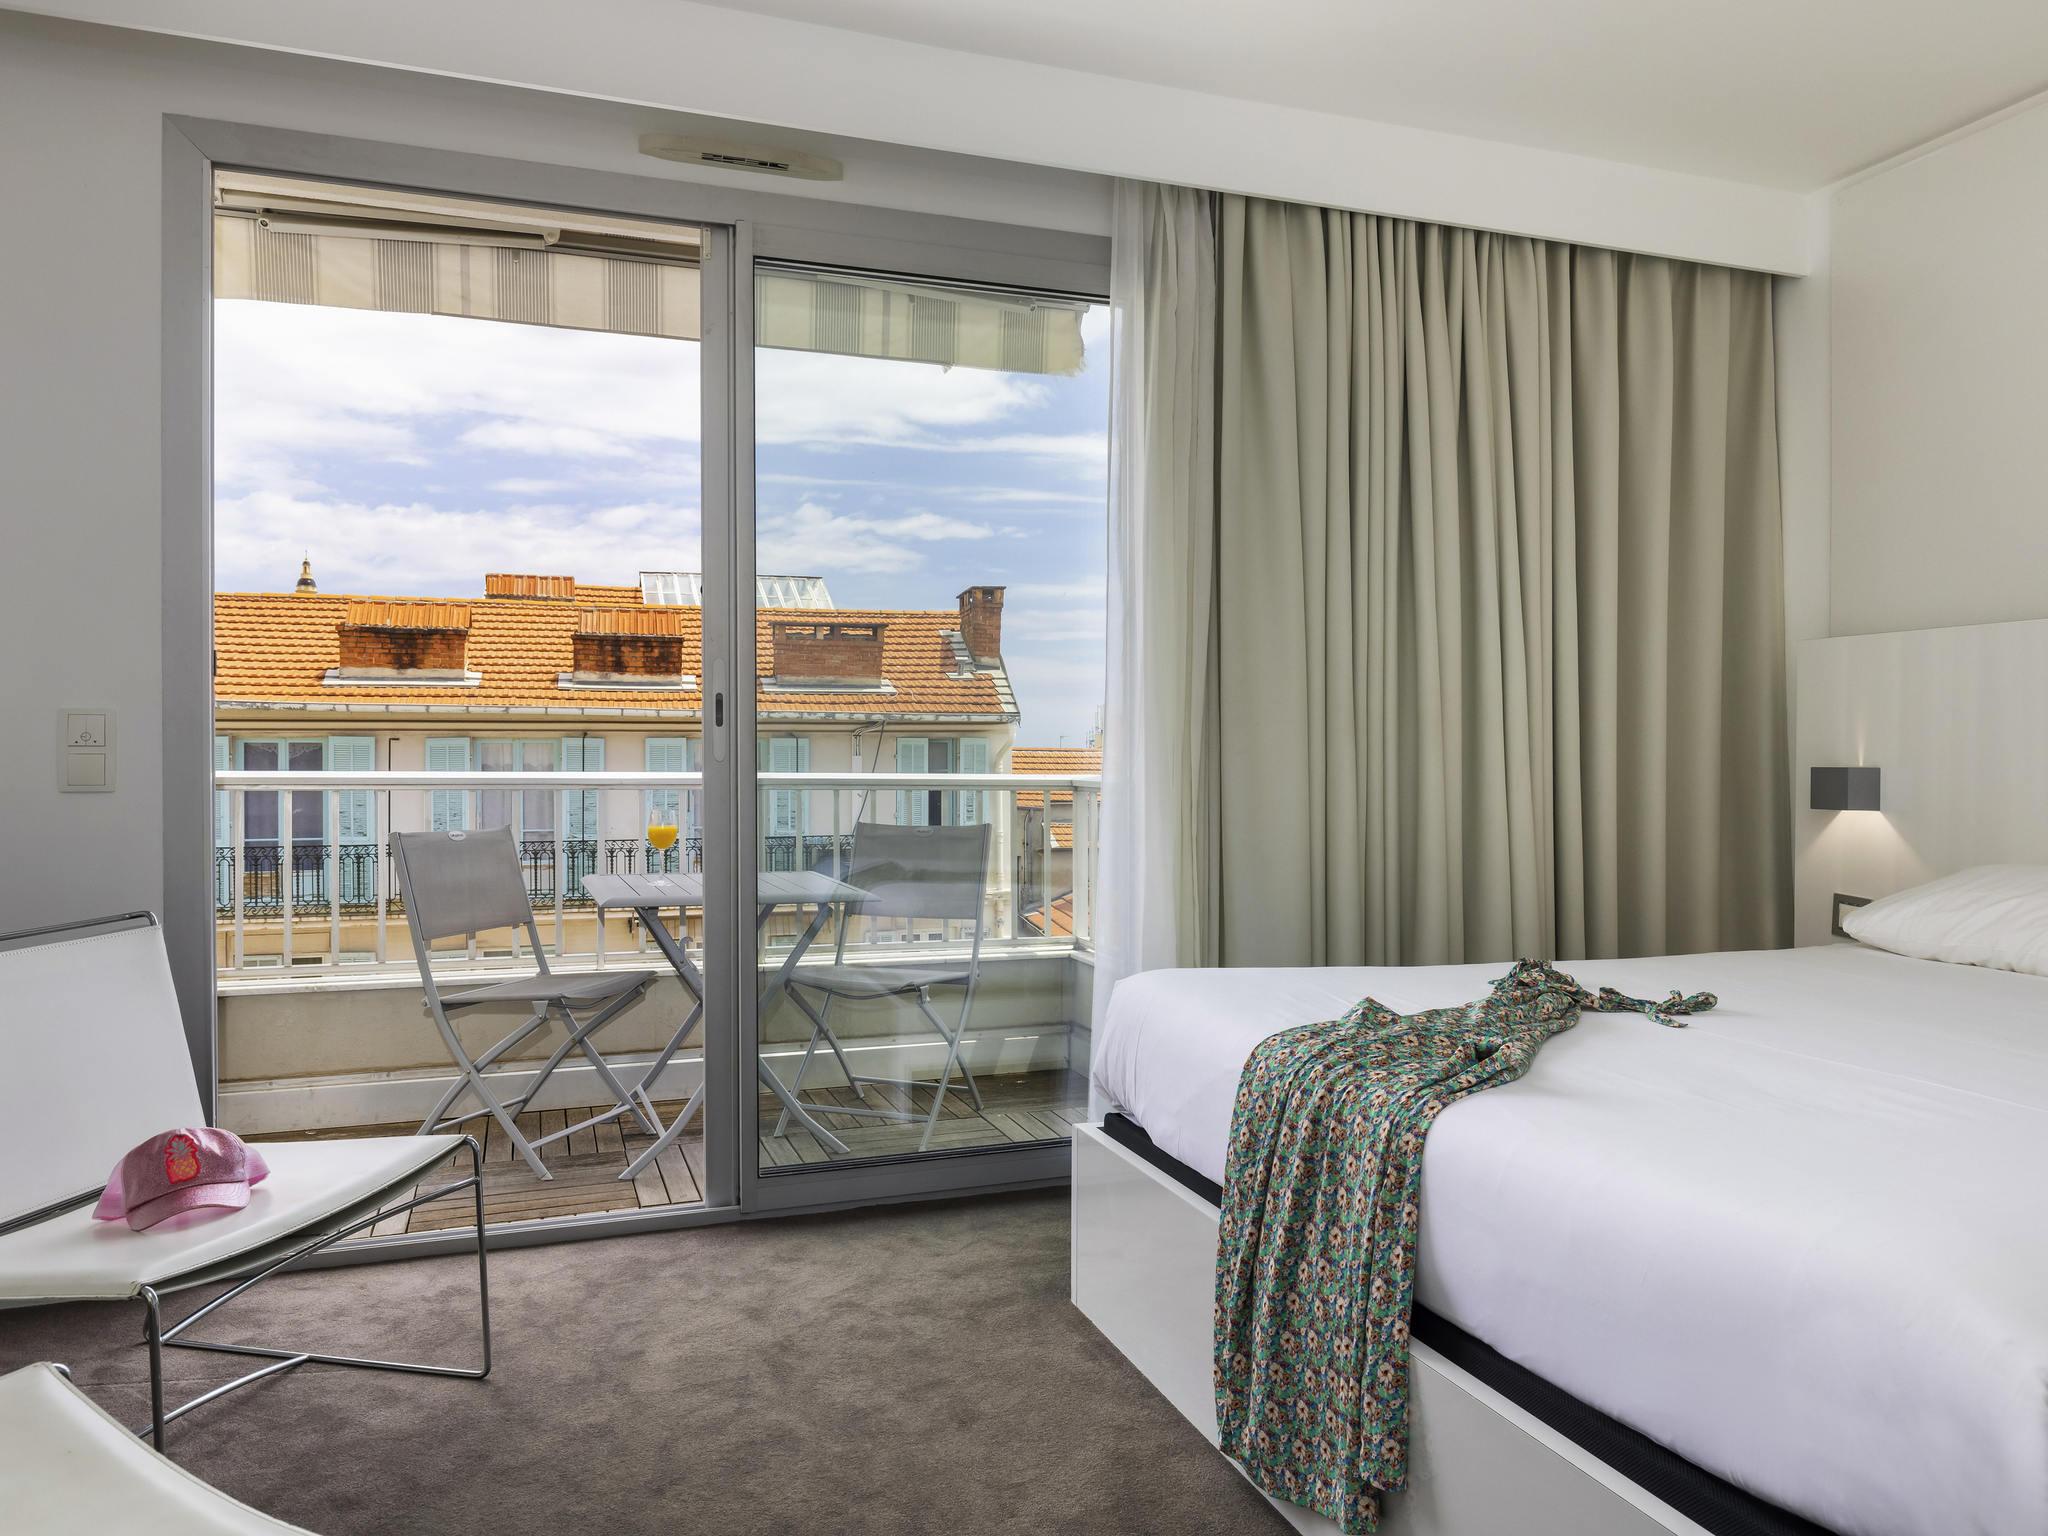 Menton France Lodging -  hotel ibis styles menton centre